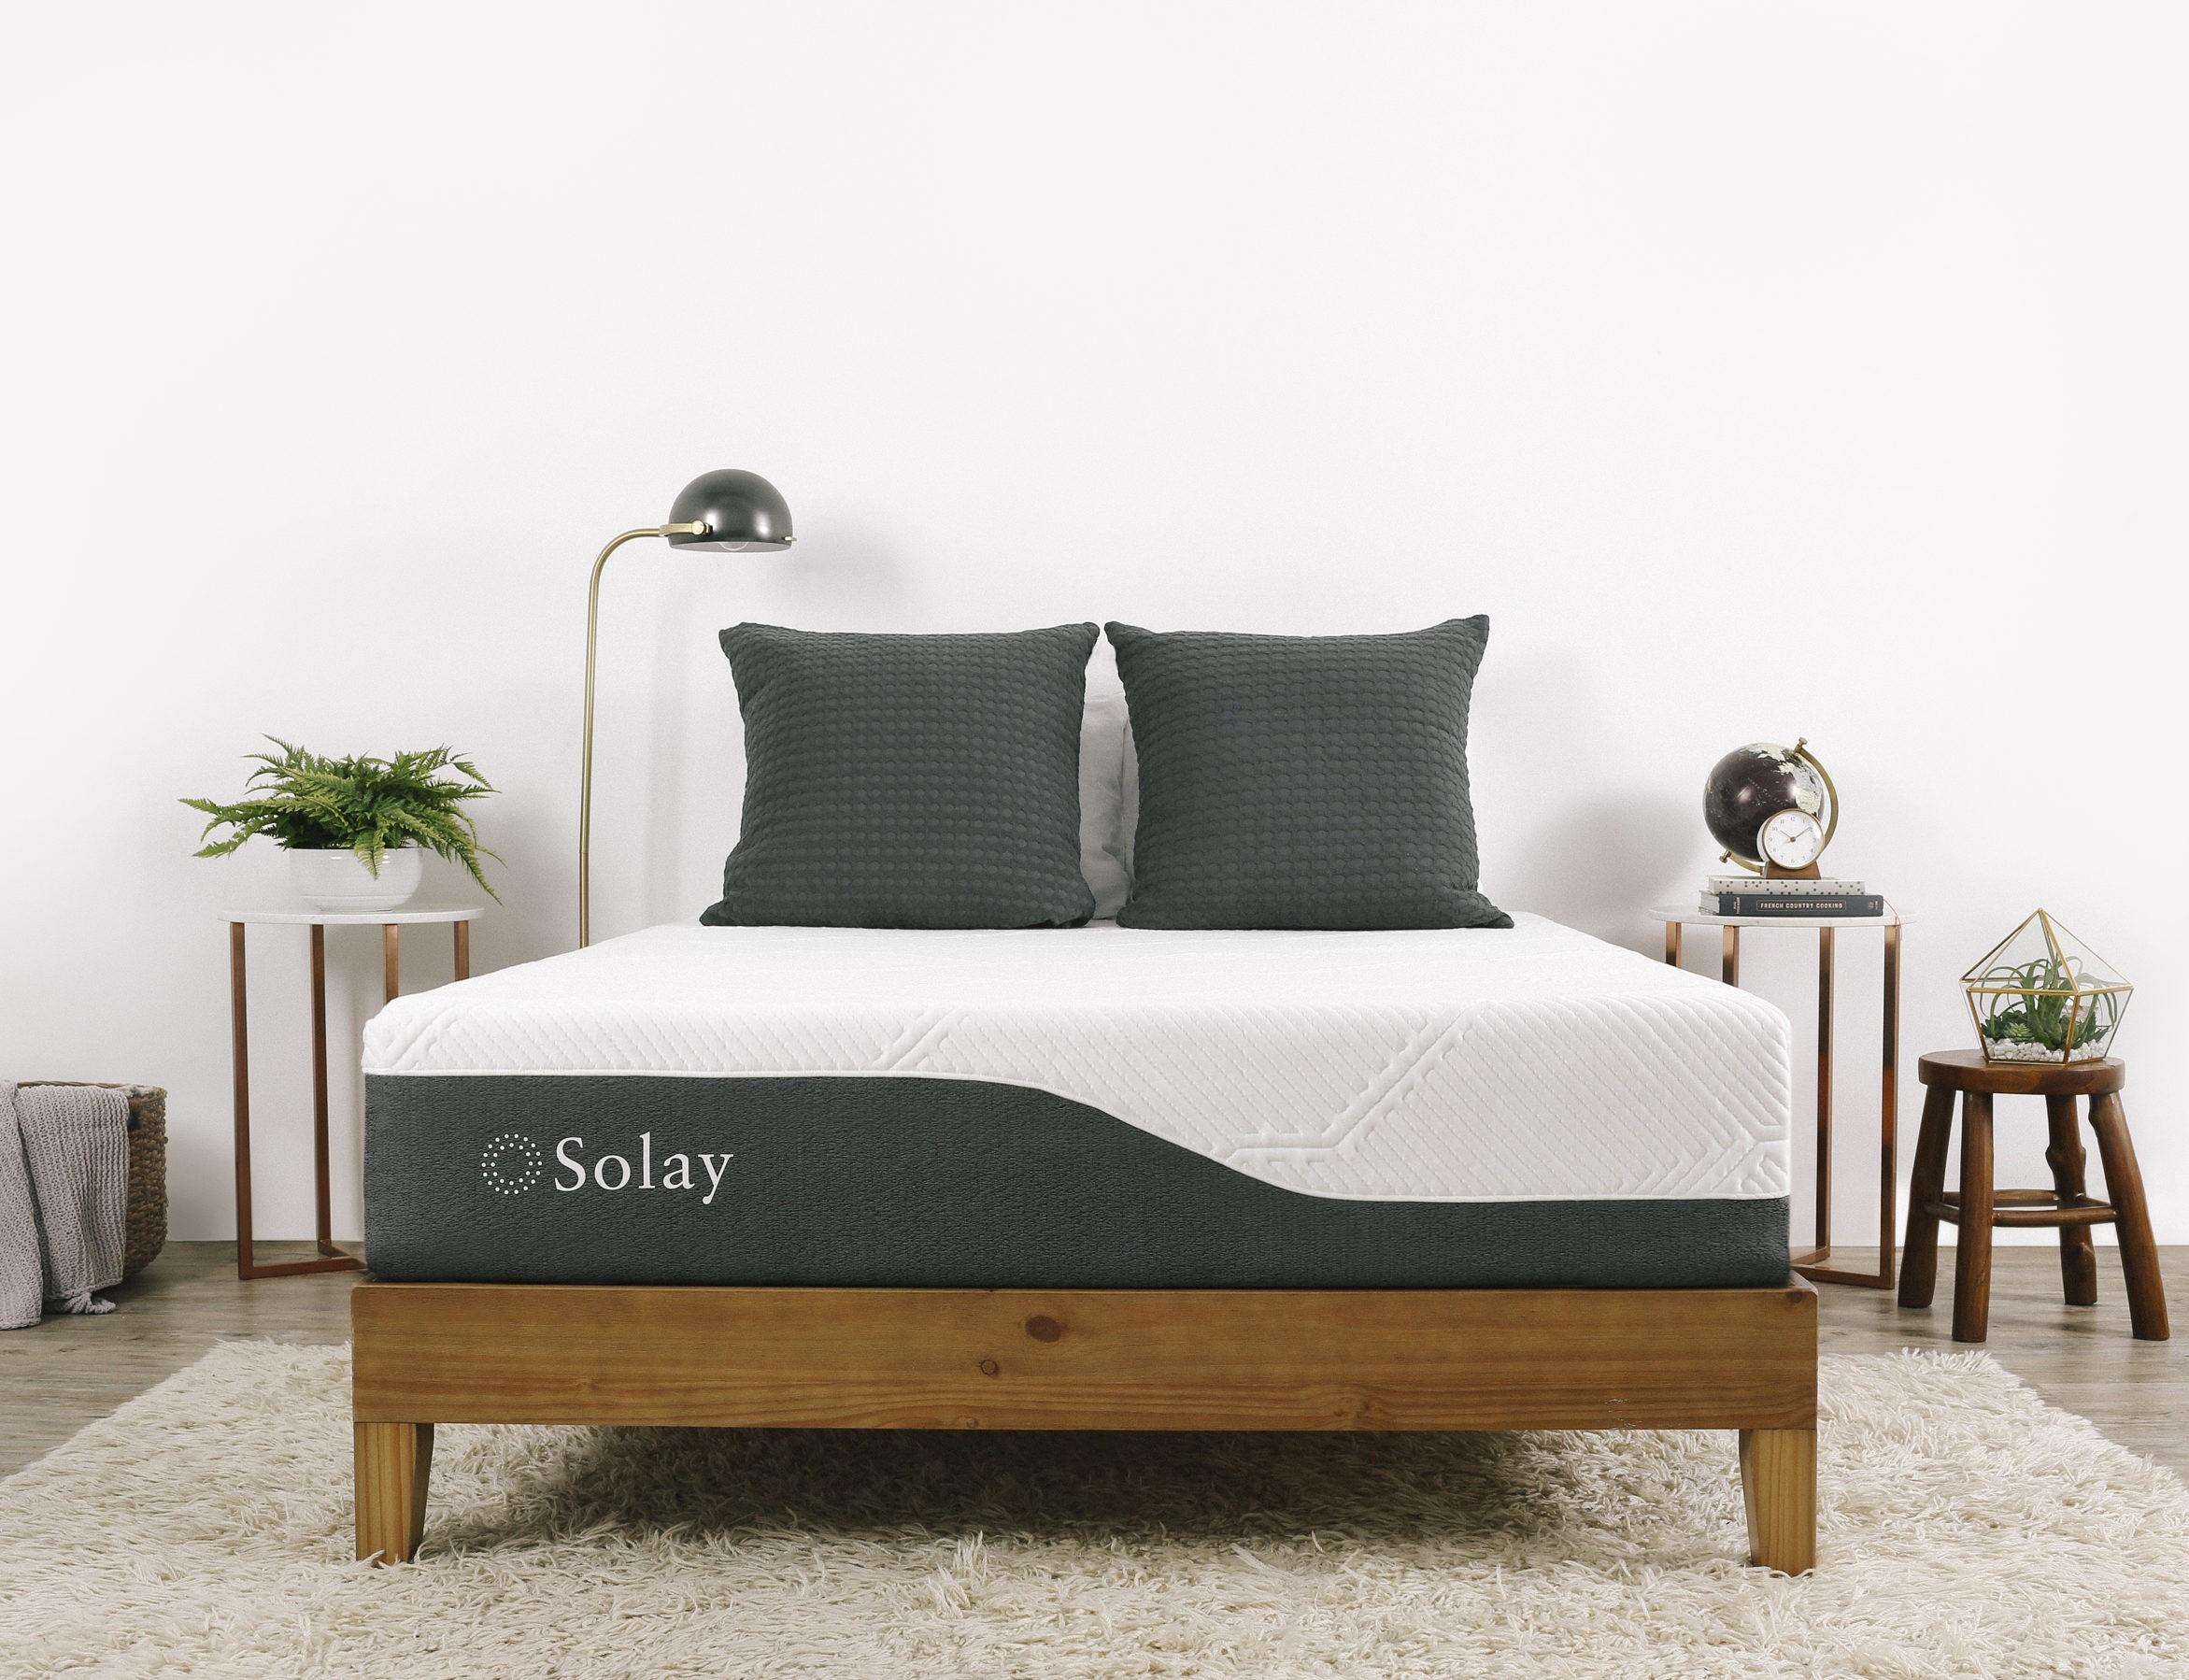 Solay mattress in bedroom